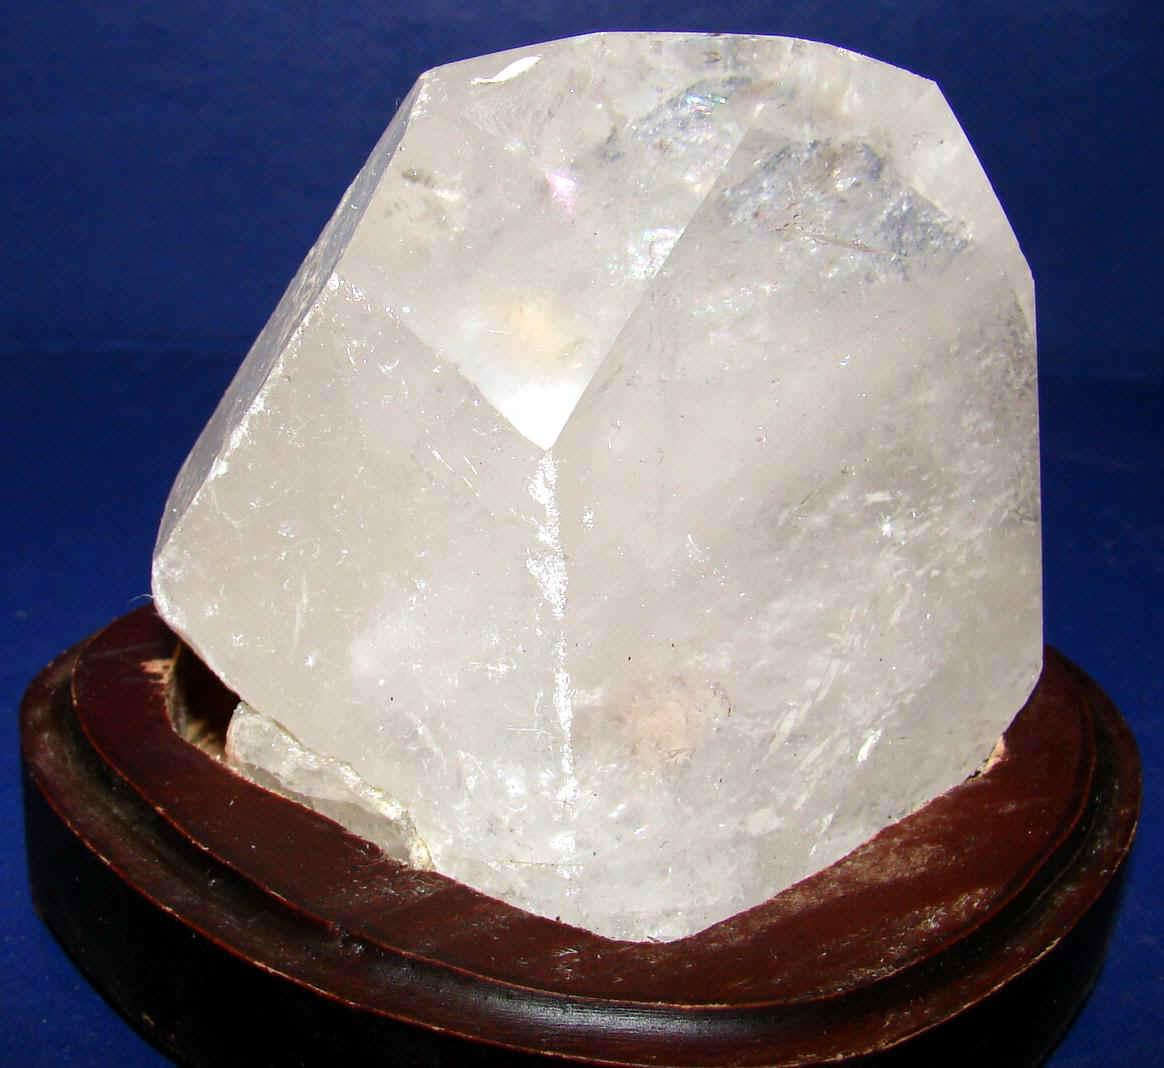 http://www.quartzcrystals.net/woodxl-8.jpg (582341 bytes)